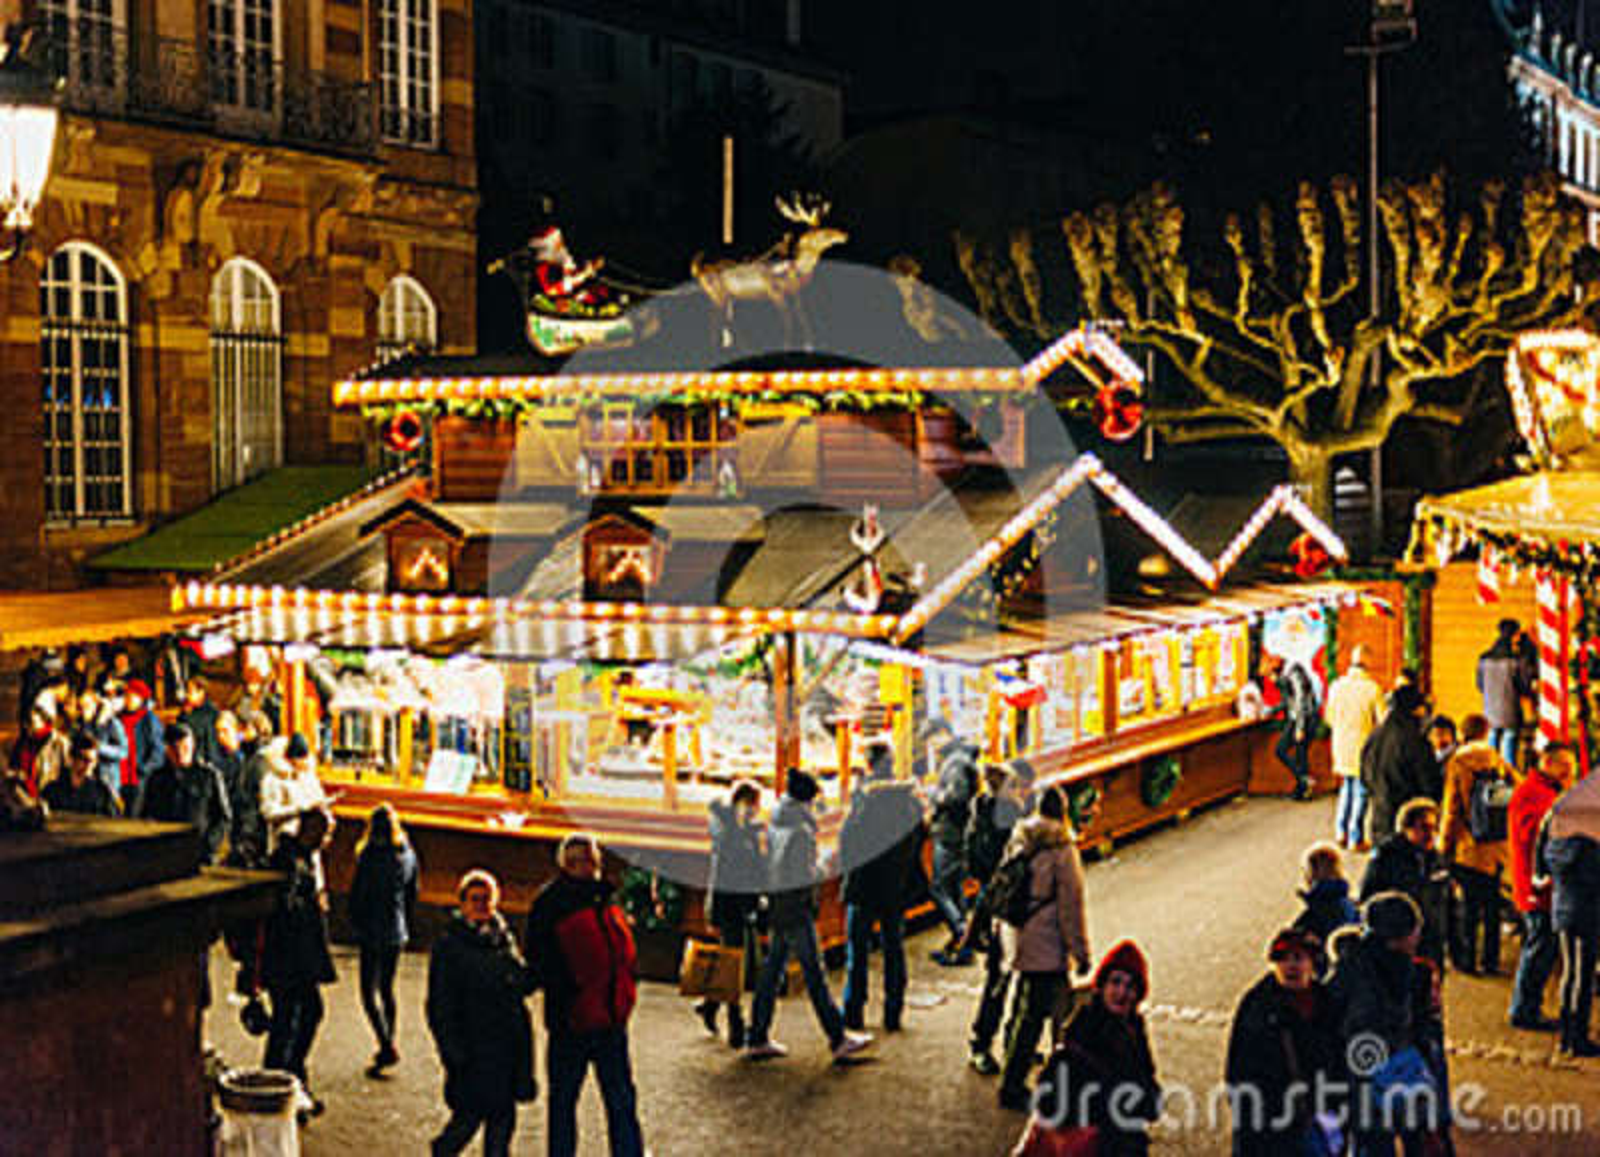 Den Hogstamda Sikten Av Jul Marknadsfor I Strasbourg Frankrike Redaktionell Foto Bild Av Ovanf 84379135